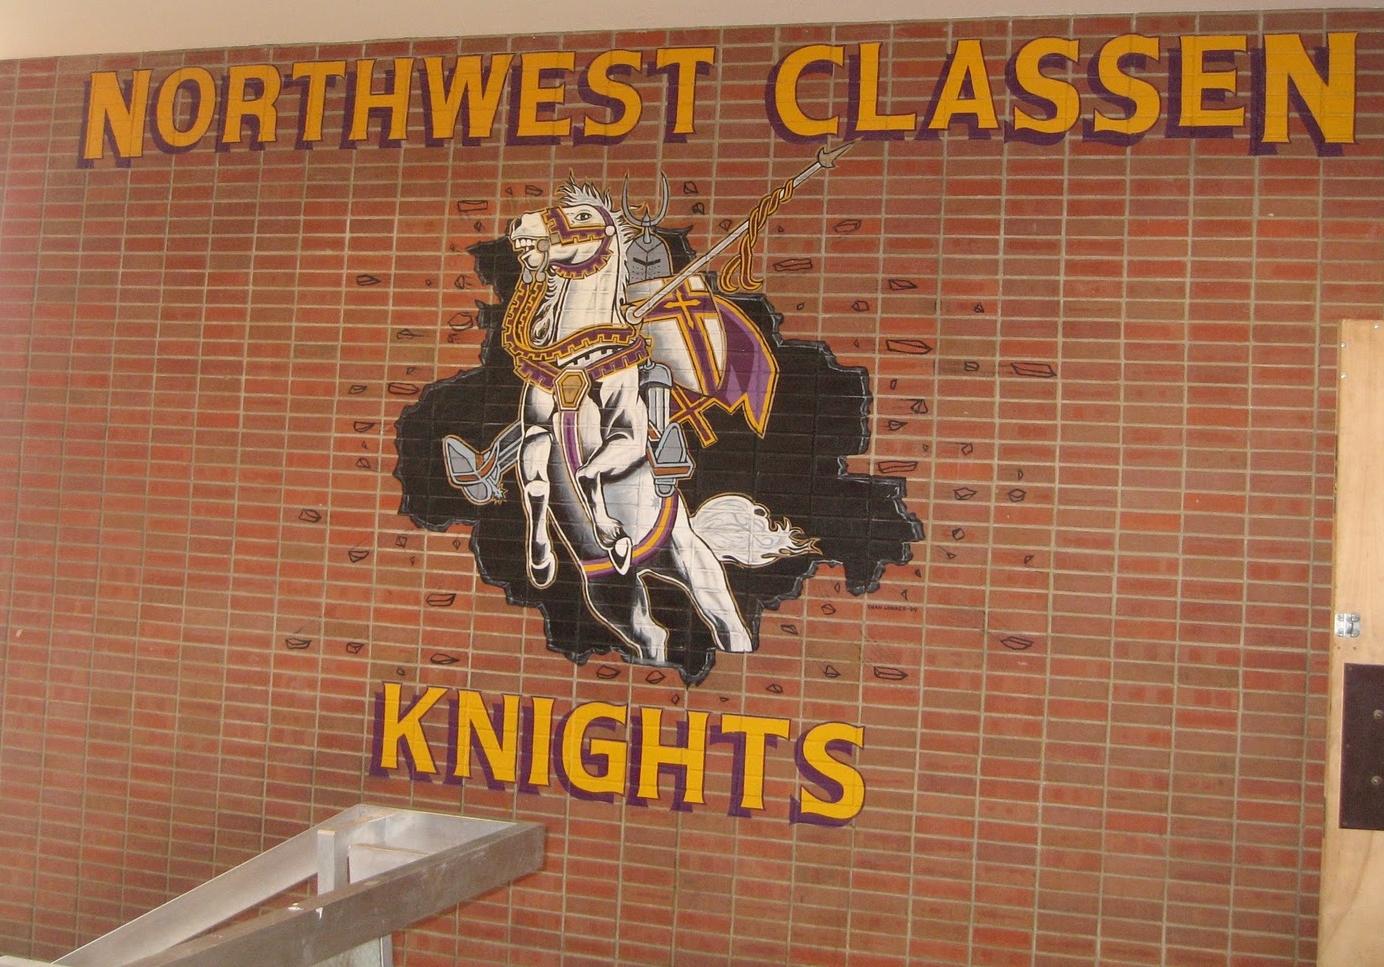 IMG_4336-Oklahoma City, Oklahoma - Northwest Classen Knights (Mitch's High School, Class of 1965).jpg